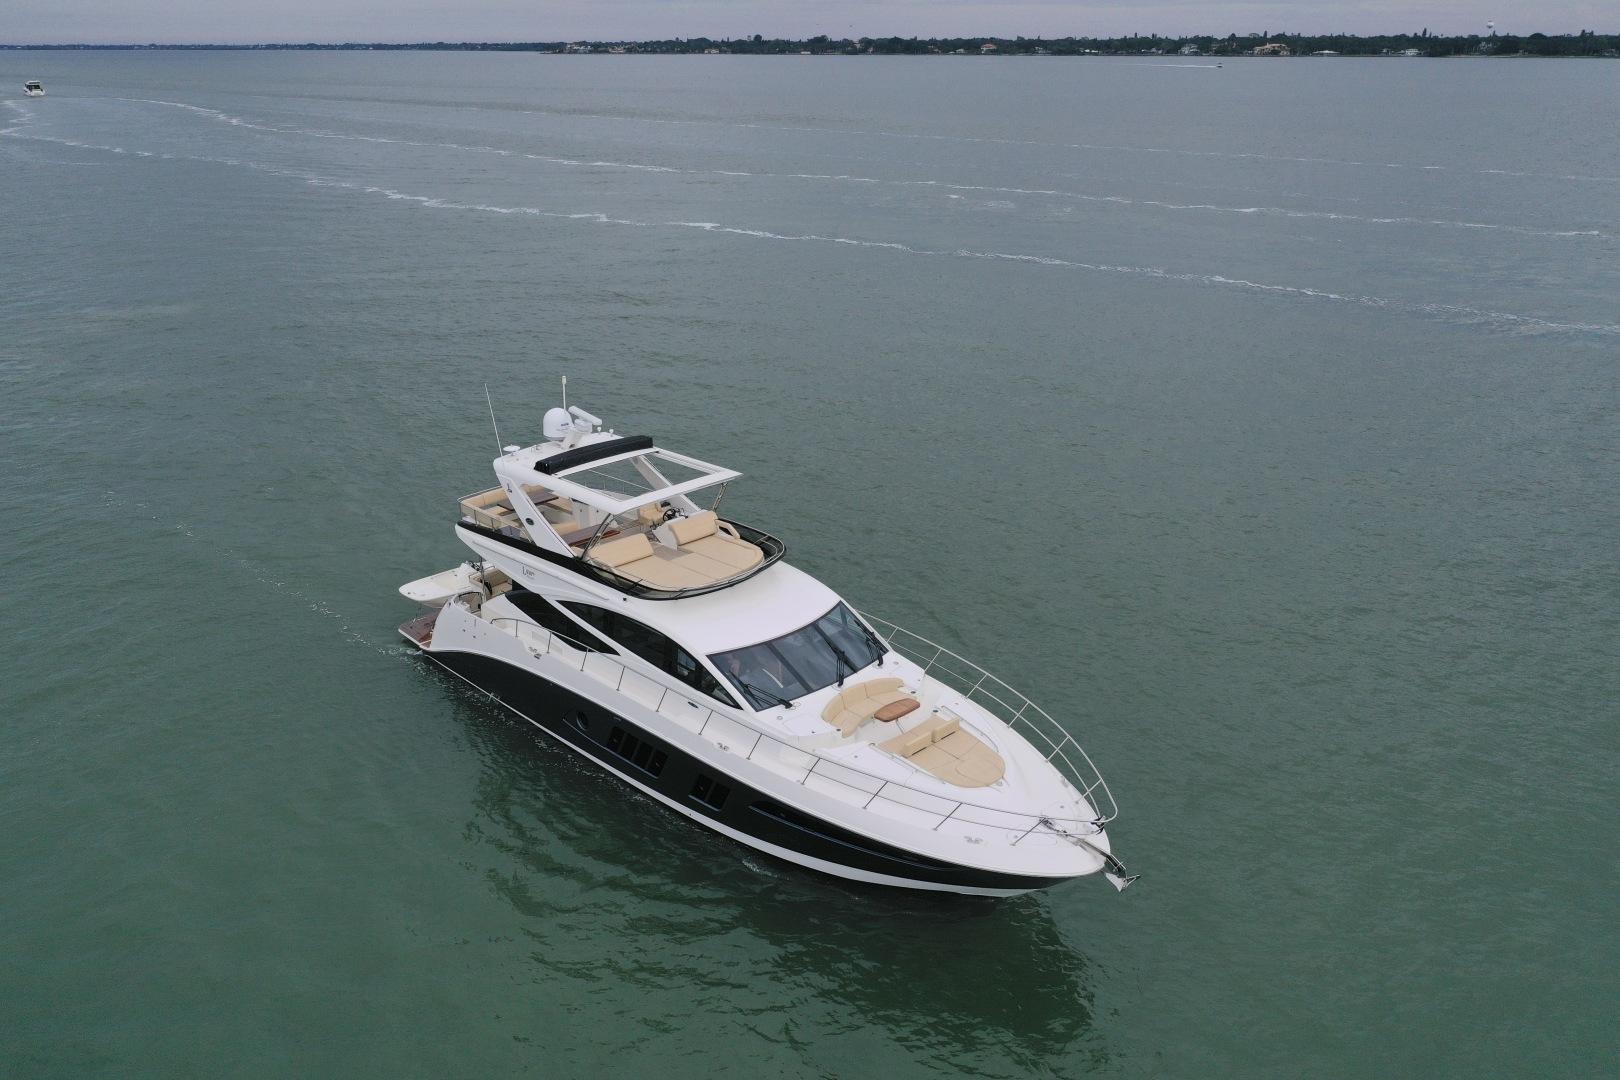 Sea Ray-L650 2016-3x's the Charm Longboat Key-Florida-United States-2016 Sea Ray L650 -1251877 | Thumbnail